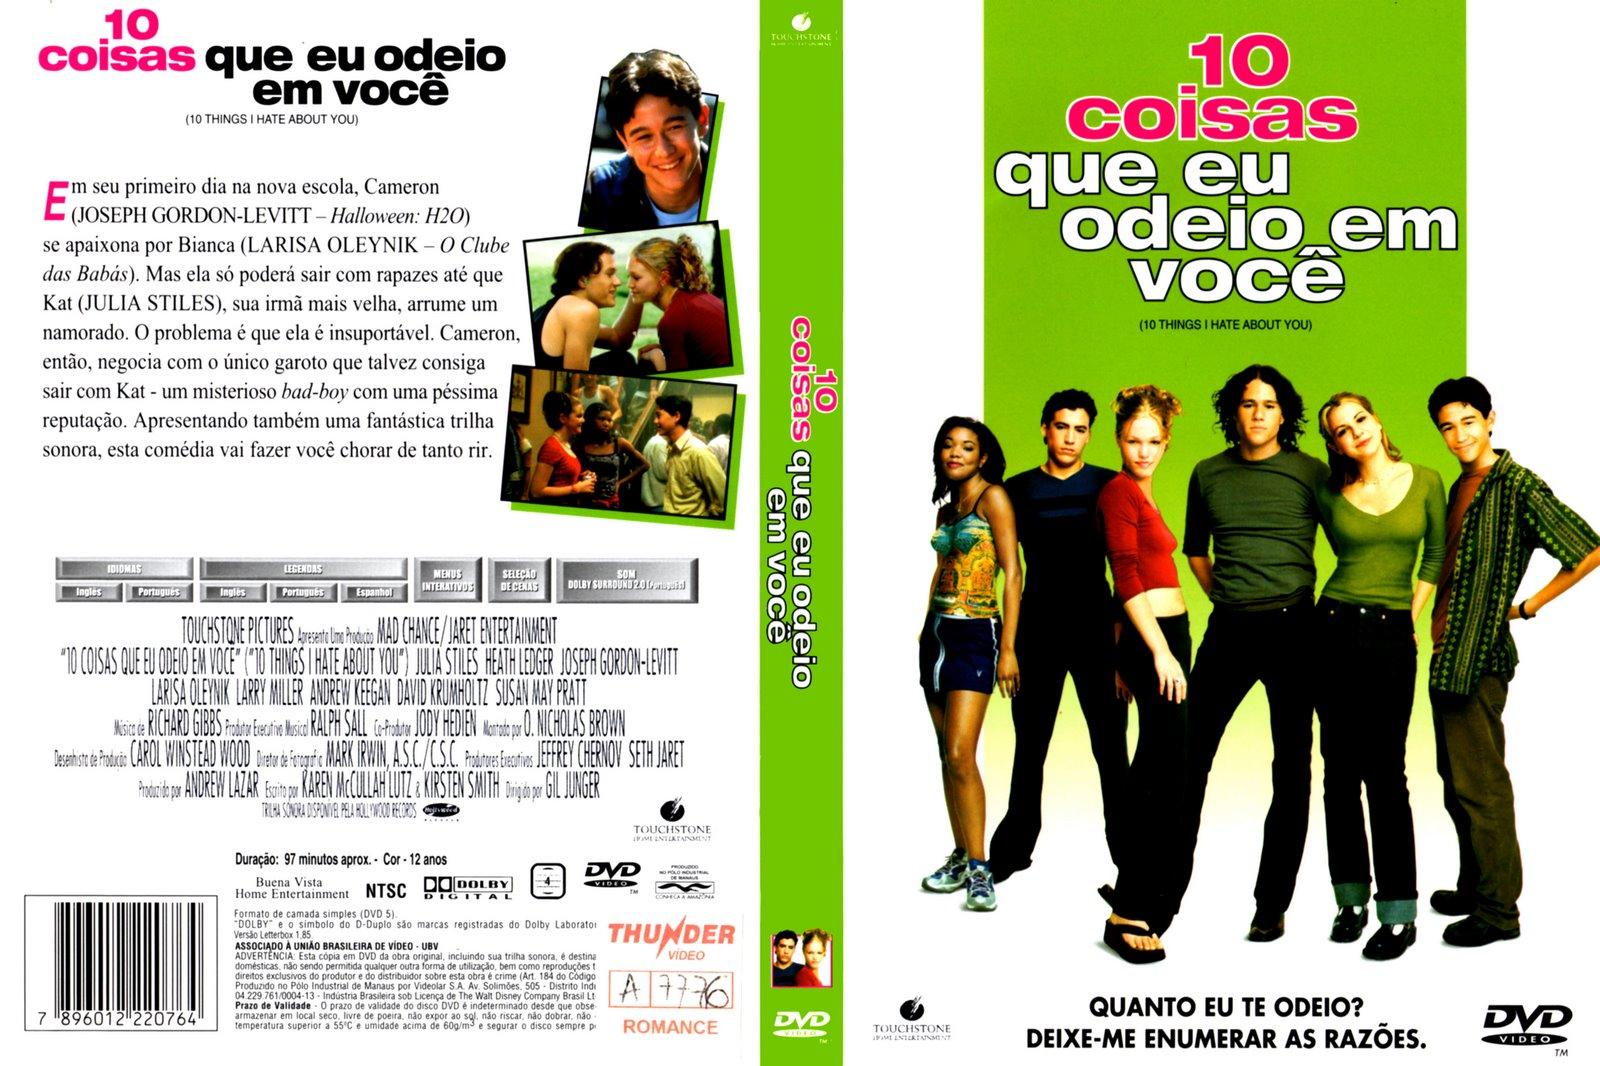 http://4.bp.blogspot.com/_avx0CDv74_c/TCo4Xl9J1_I/AAAAAAAAAAM/Qu_QYoODrQQ/s1600/%3D_iso-8859-1_Q_10_Coisas_Que_Eu_Odeio_Em_Voc%3DEA-706115_jpg_%3D.jpg